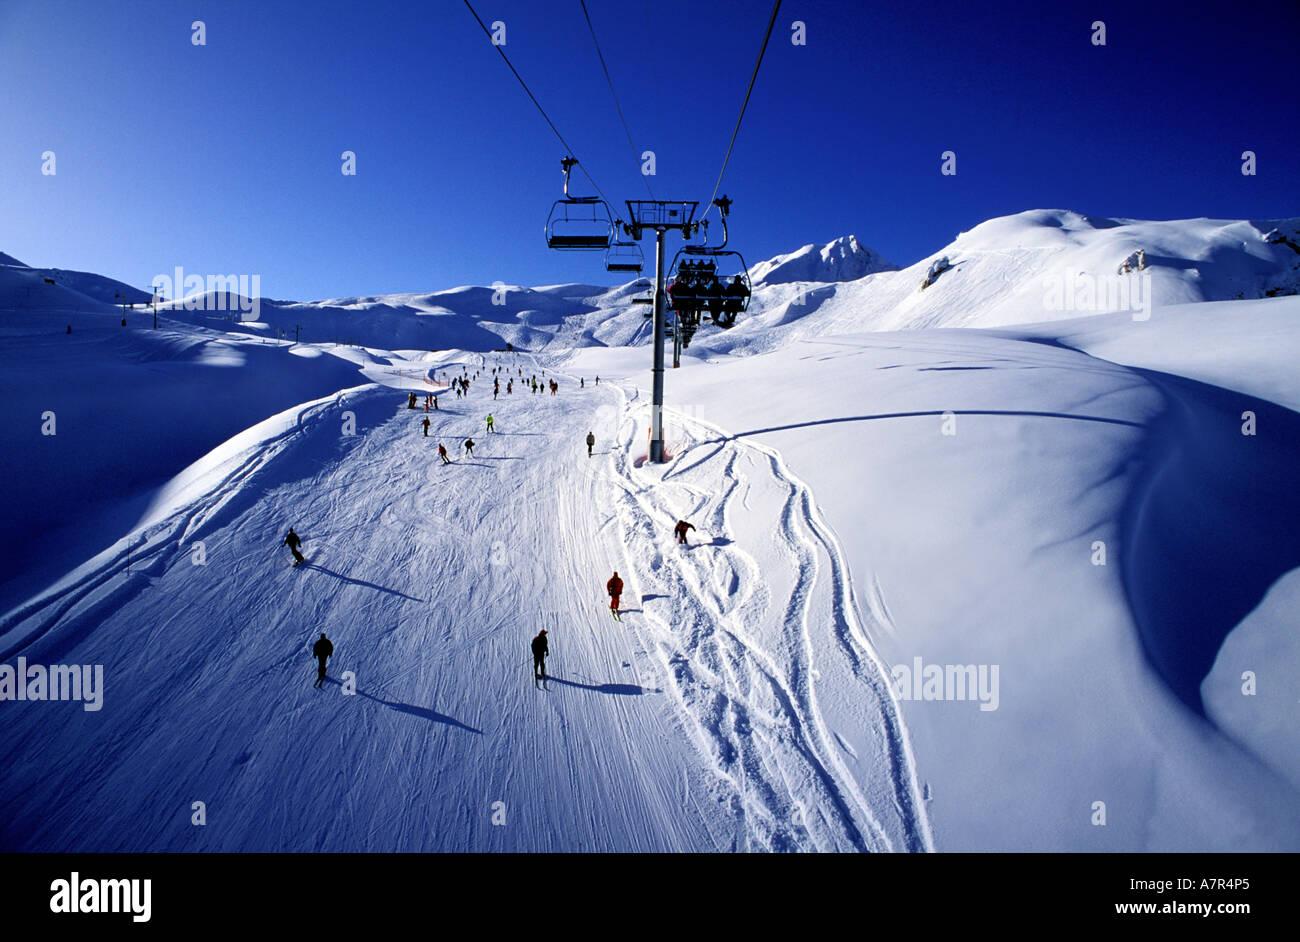 France, Savoie, skiing area of Les Arcs ski resort - Stock Image